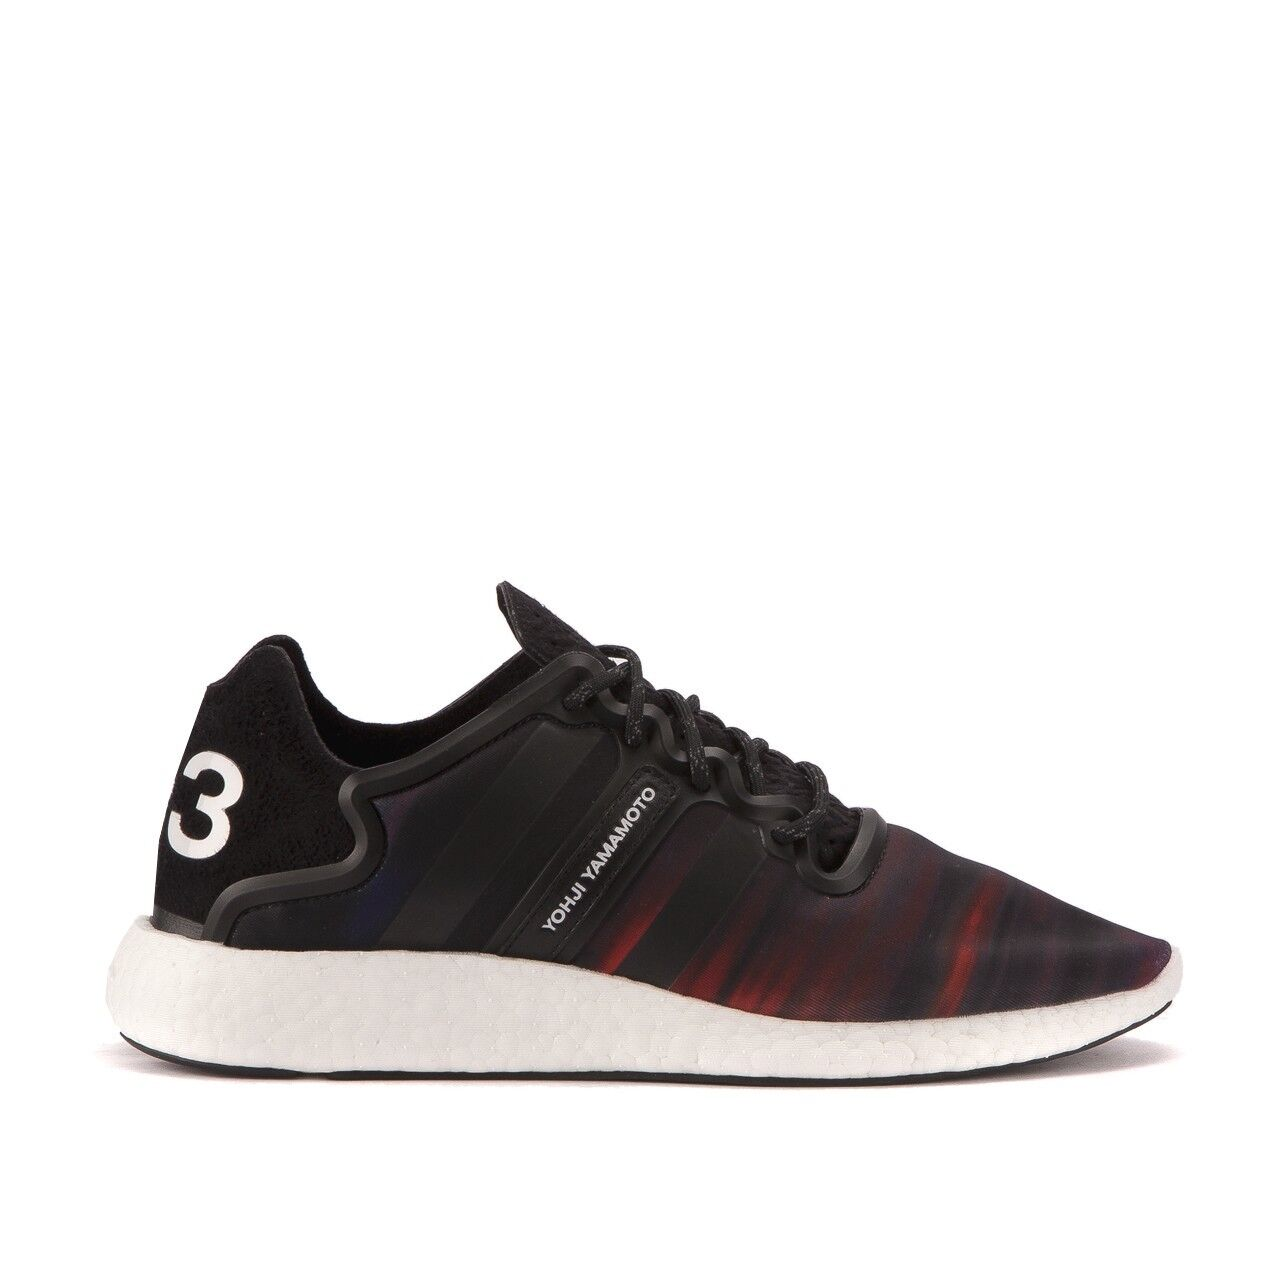 Adidas Y-3 Yohji Yamamoto Yohji Run BB4728 Boost Limited NMD Noir Sneaker Rare